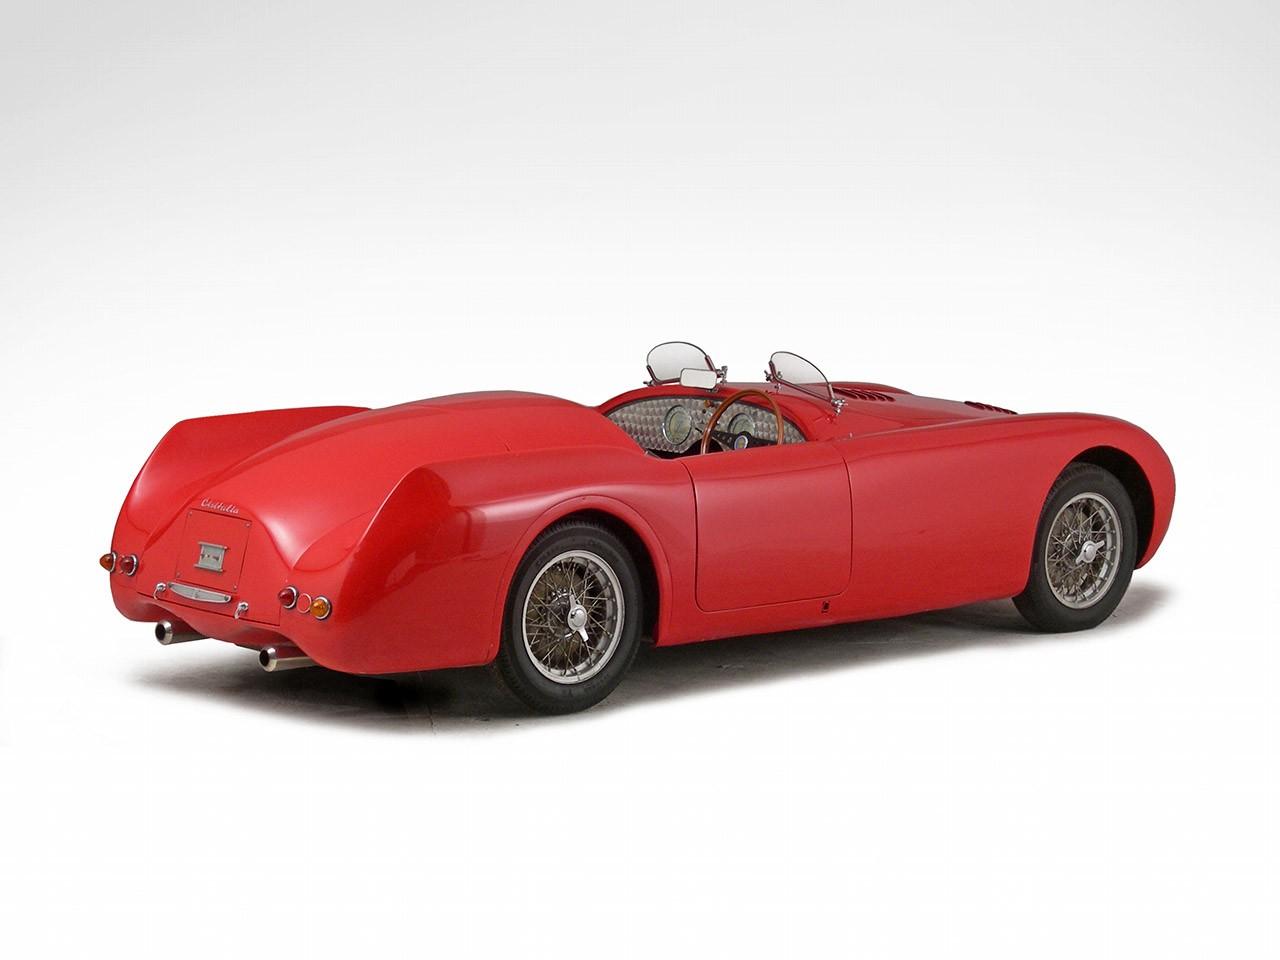 1947 Cisitalia 202 Nuvolari Mille Miglia Spyder